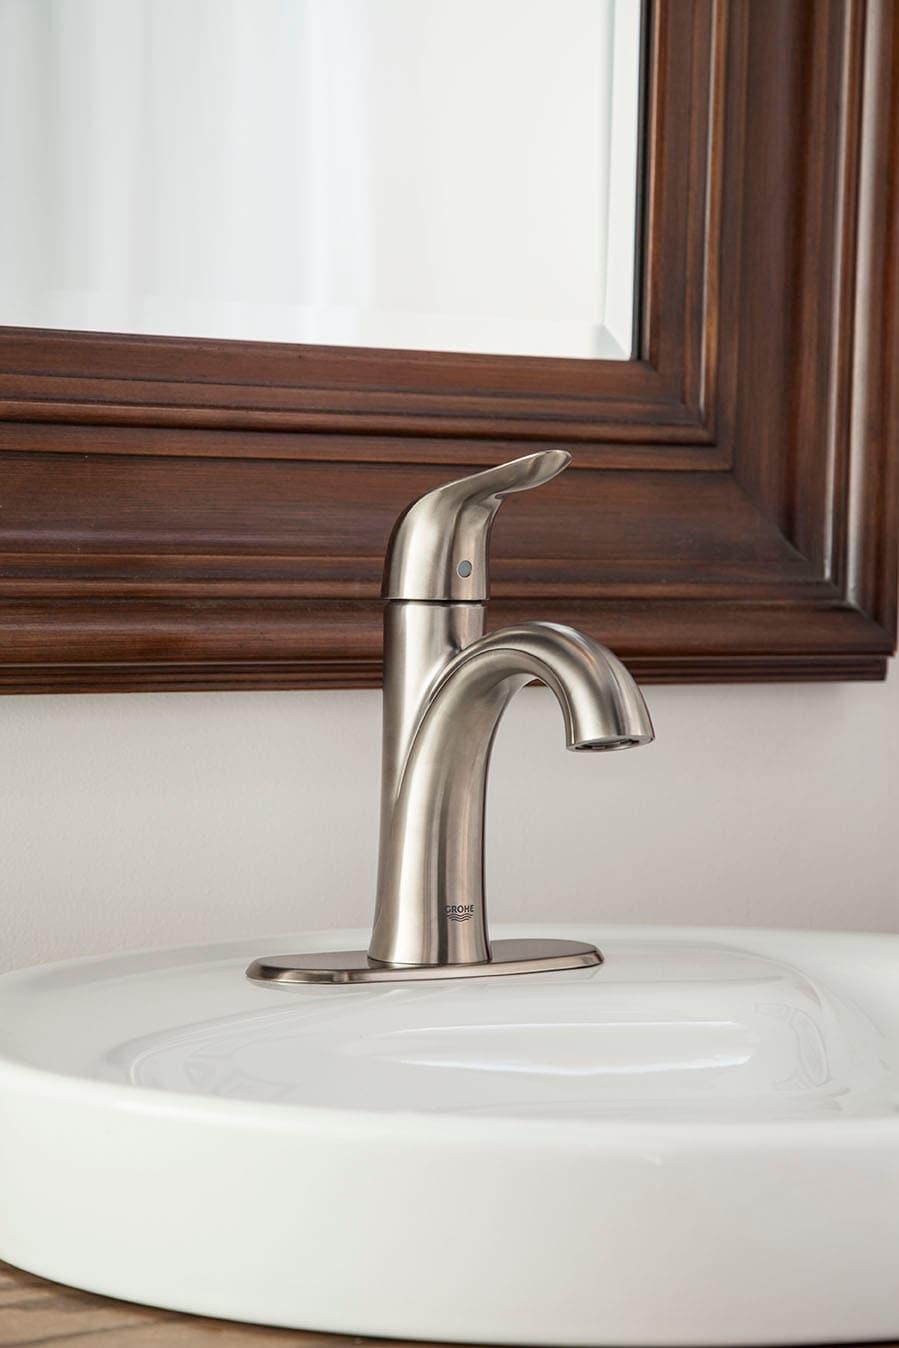 Grohe 2340200A Starlight Chrome Agira Single Hole Bathroom Faucet ...